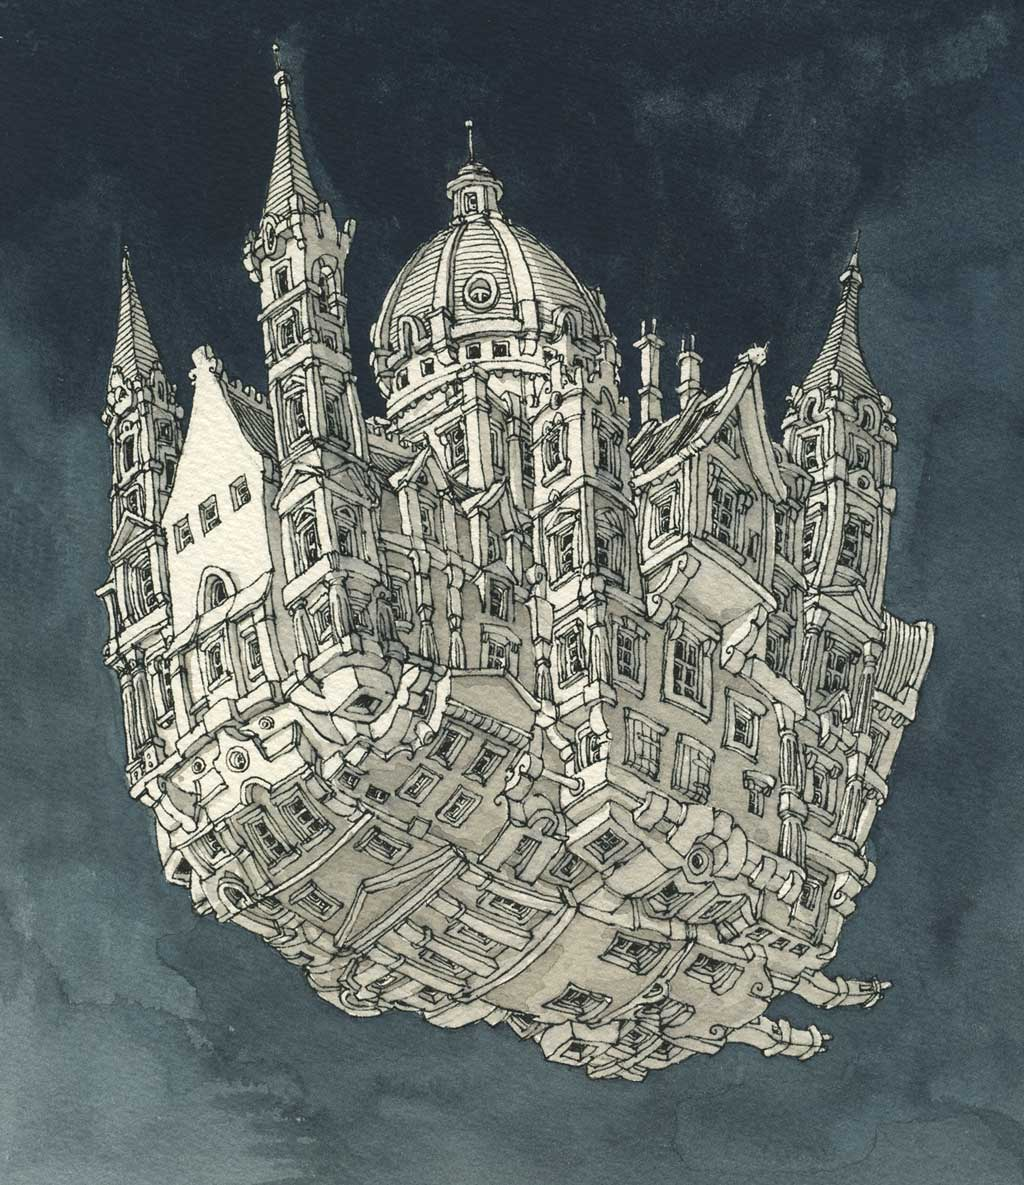 Merchant vessel by MattiasA